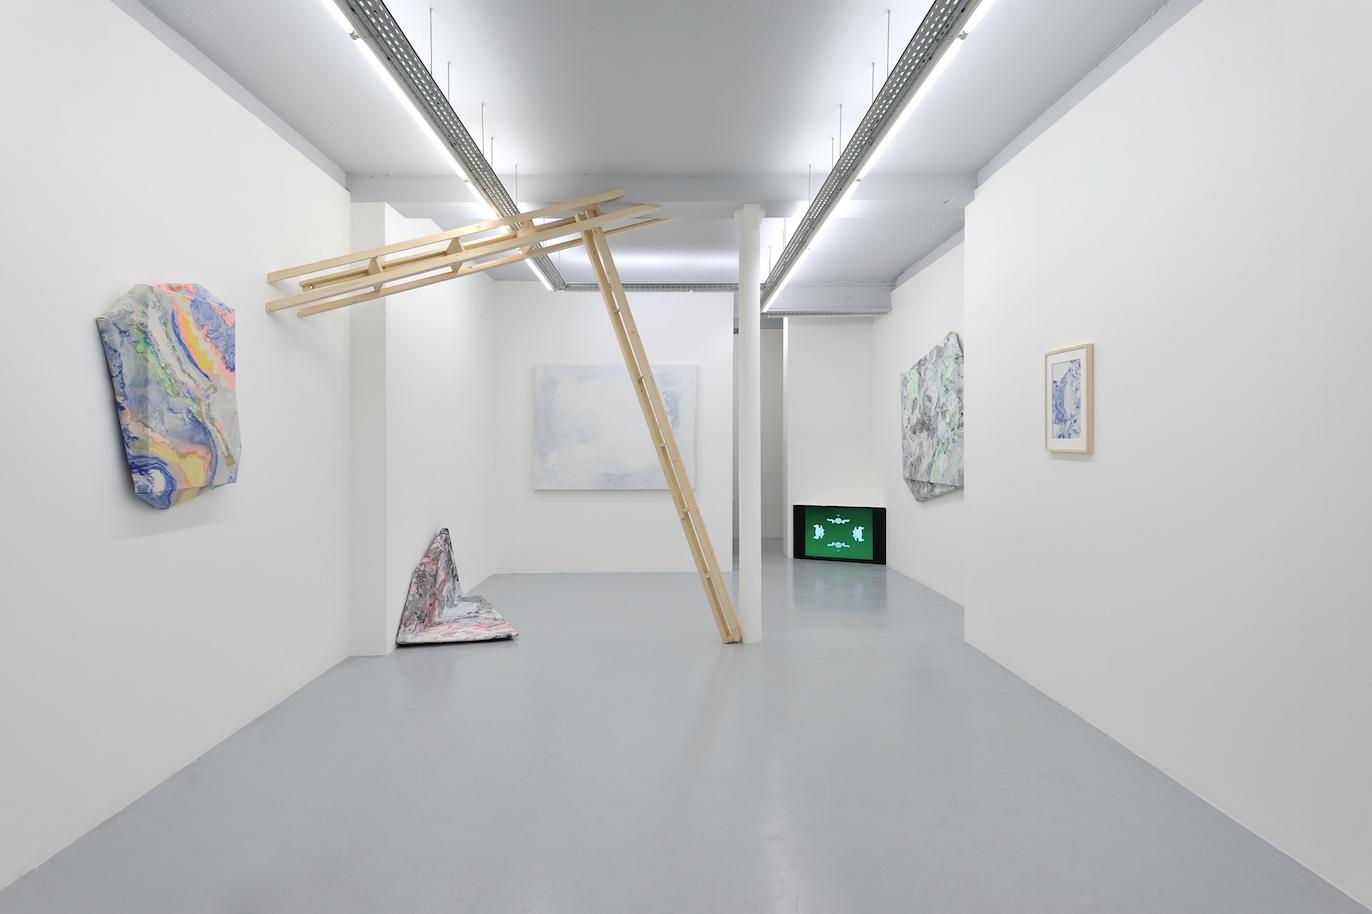 Vue d'exposition@à la galerie Olivier Robert